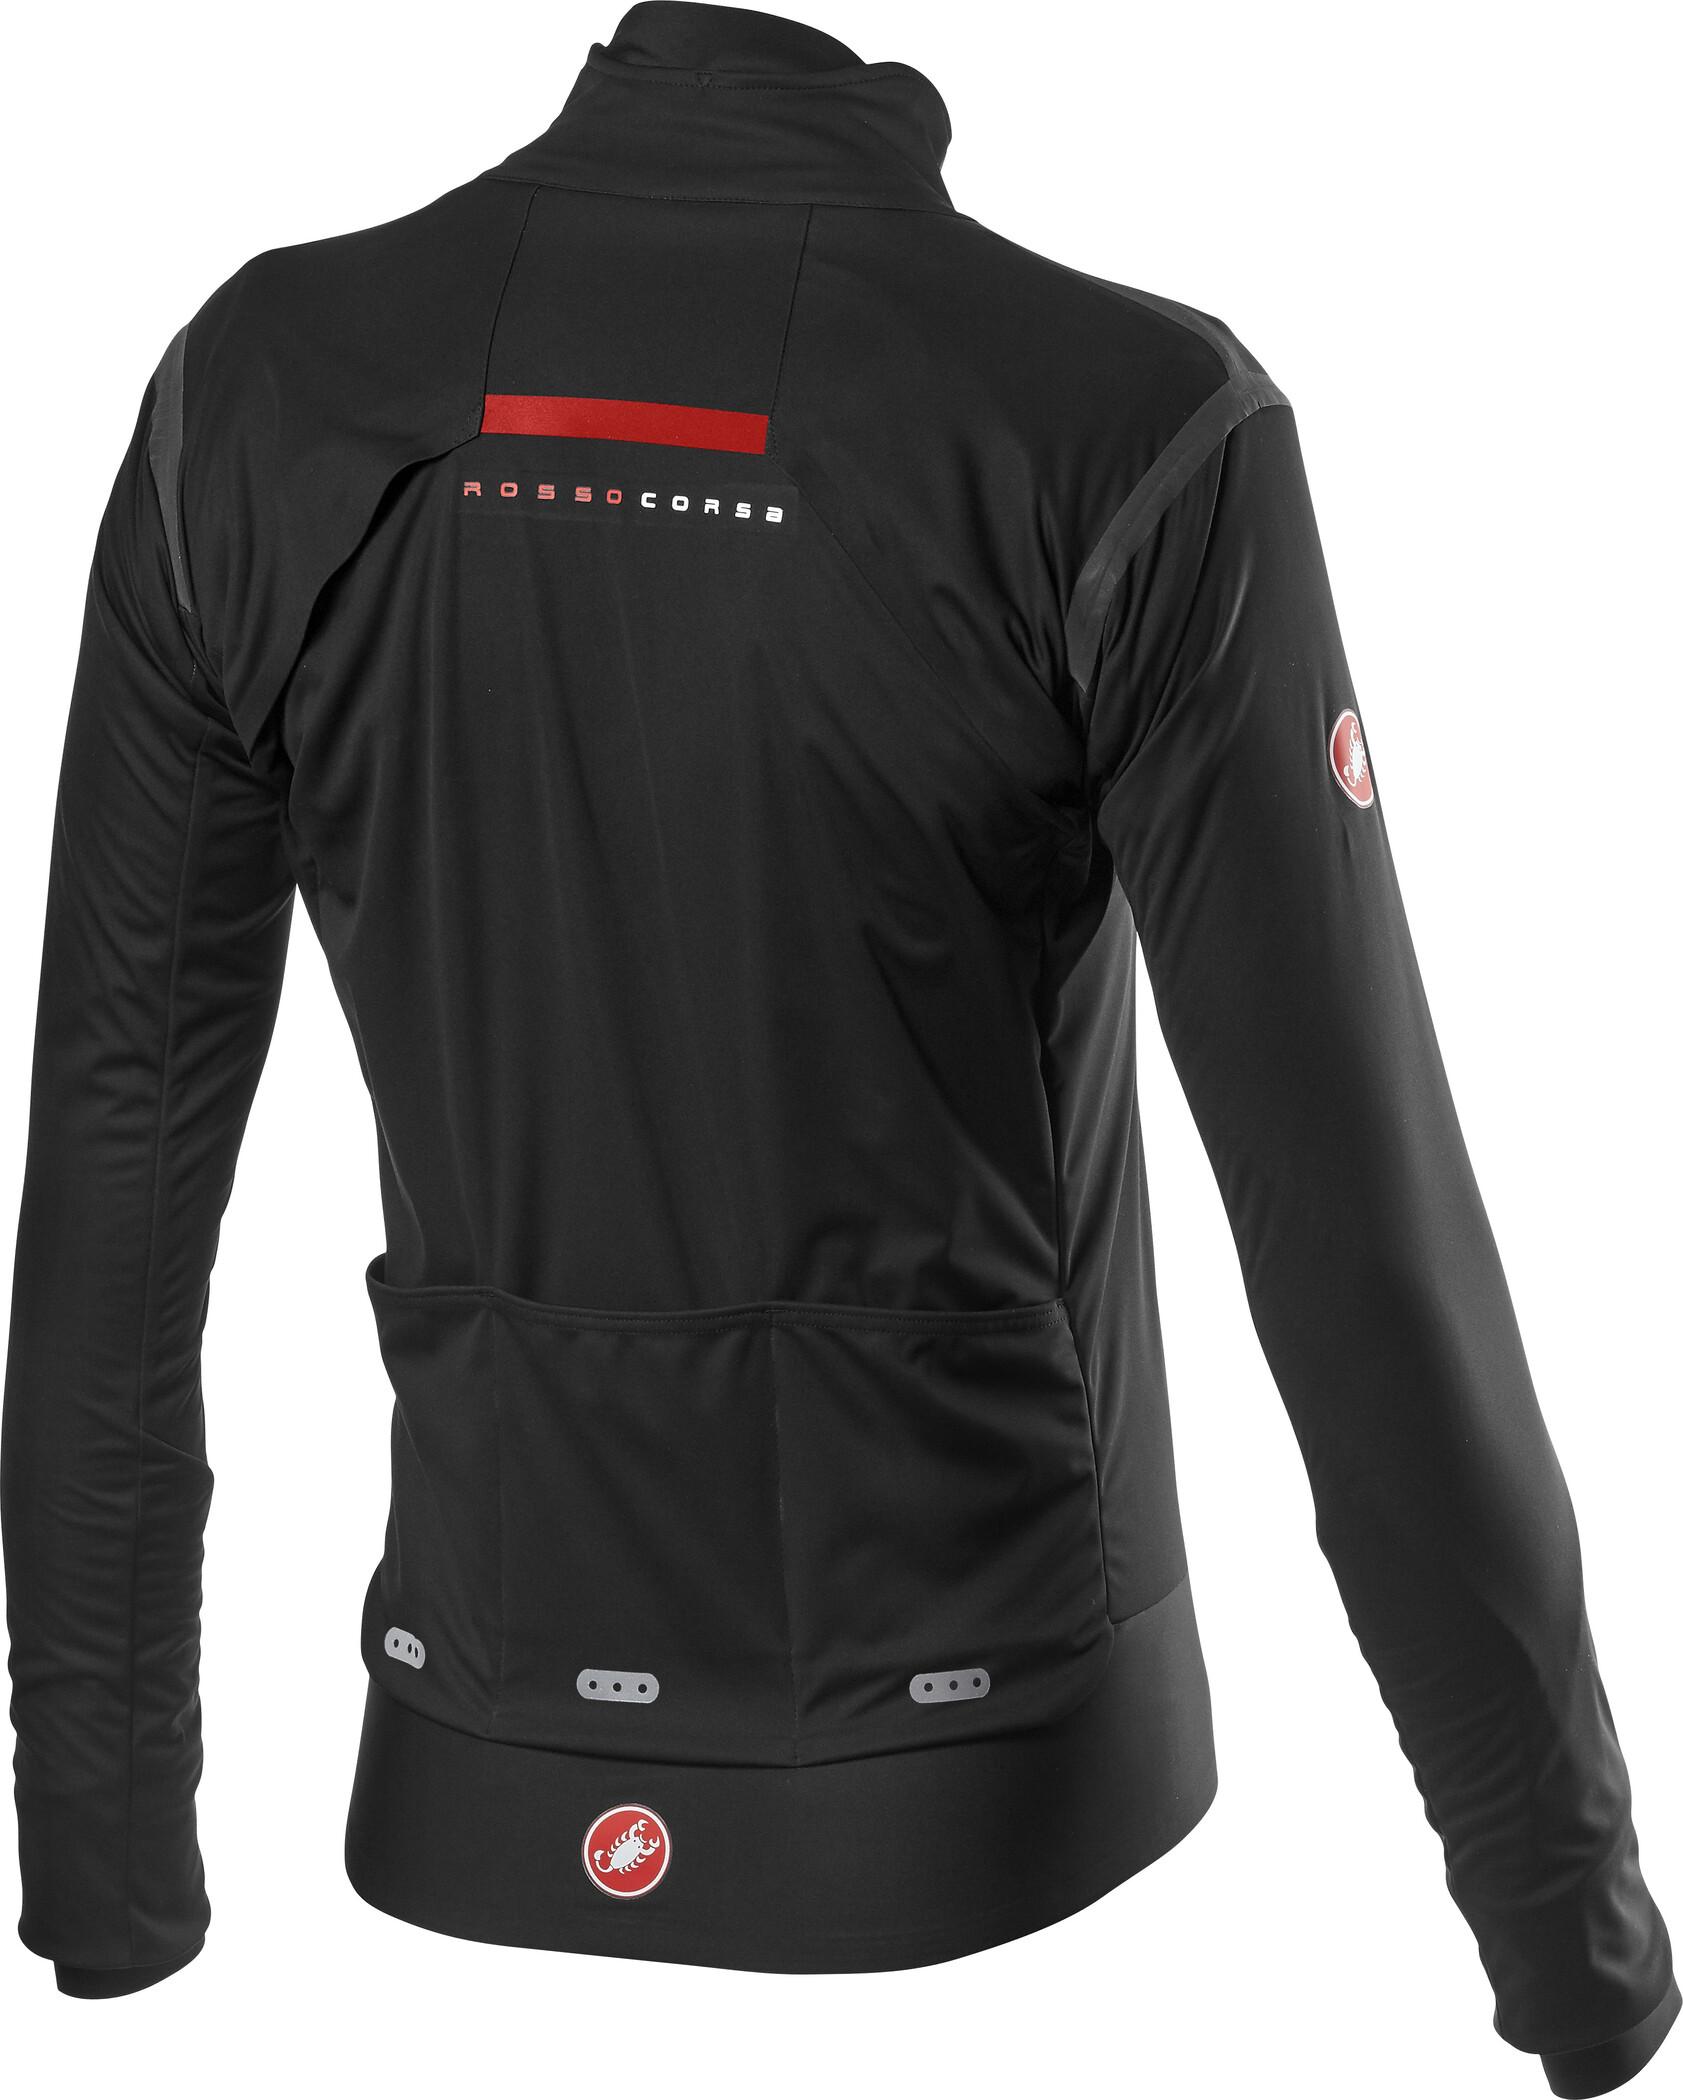 Castelli Perfetto ROS Convertible Jacket (Herr) Hitta